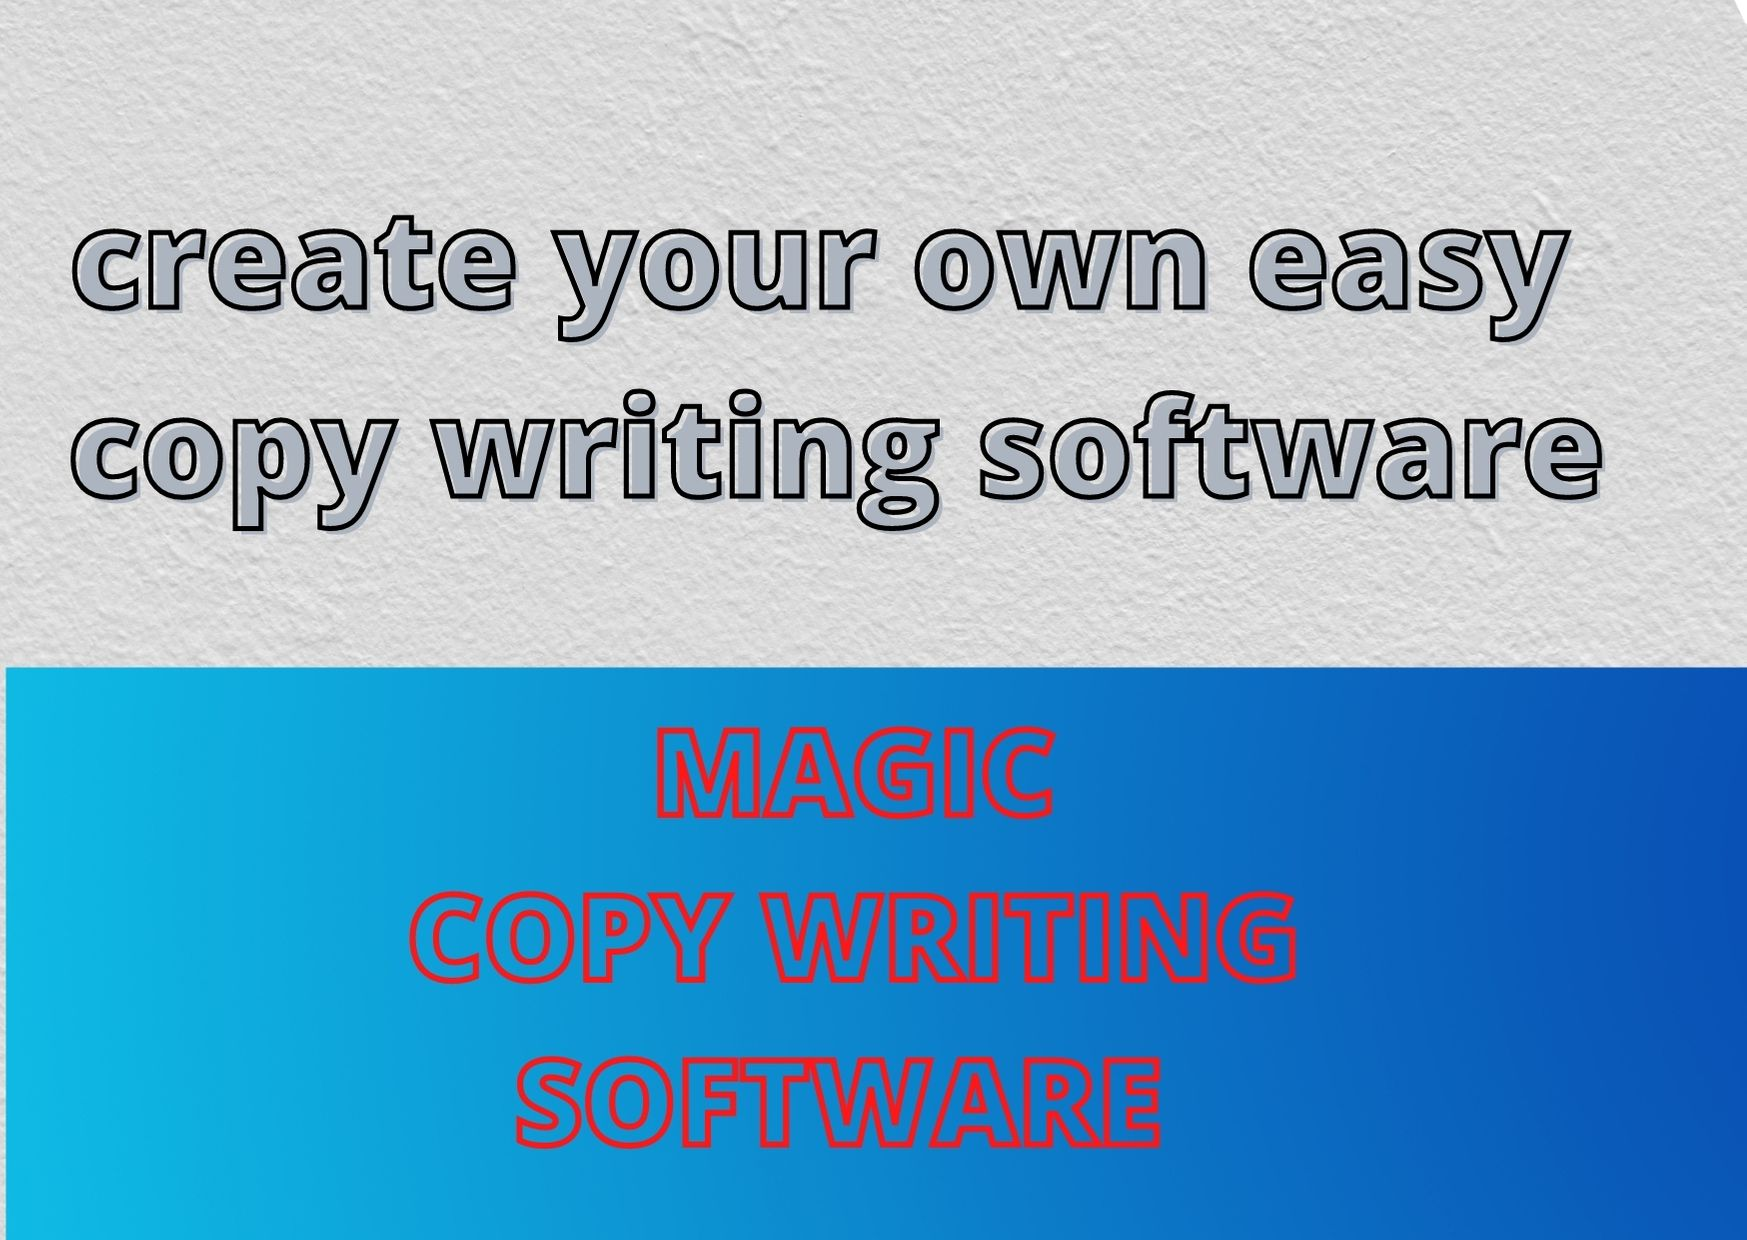 Create Your Own Magic copy Writing E-Book